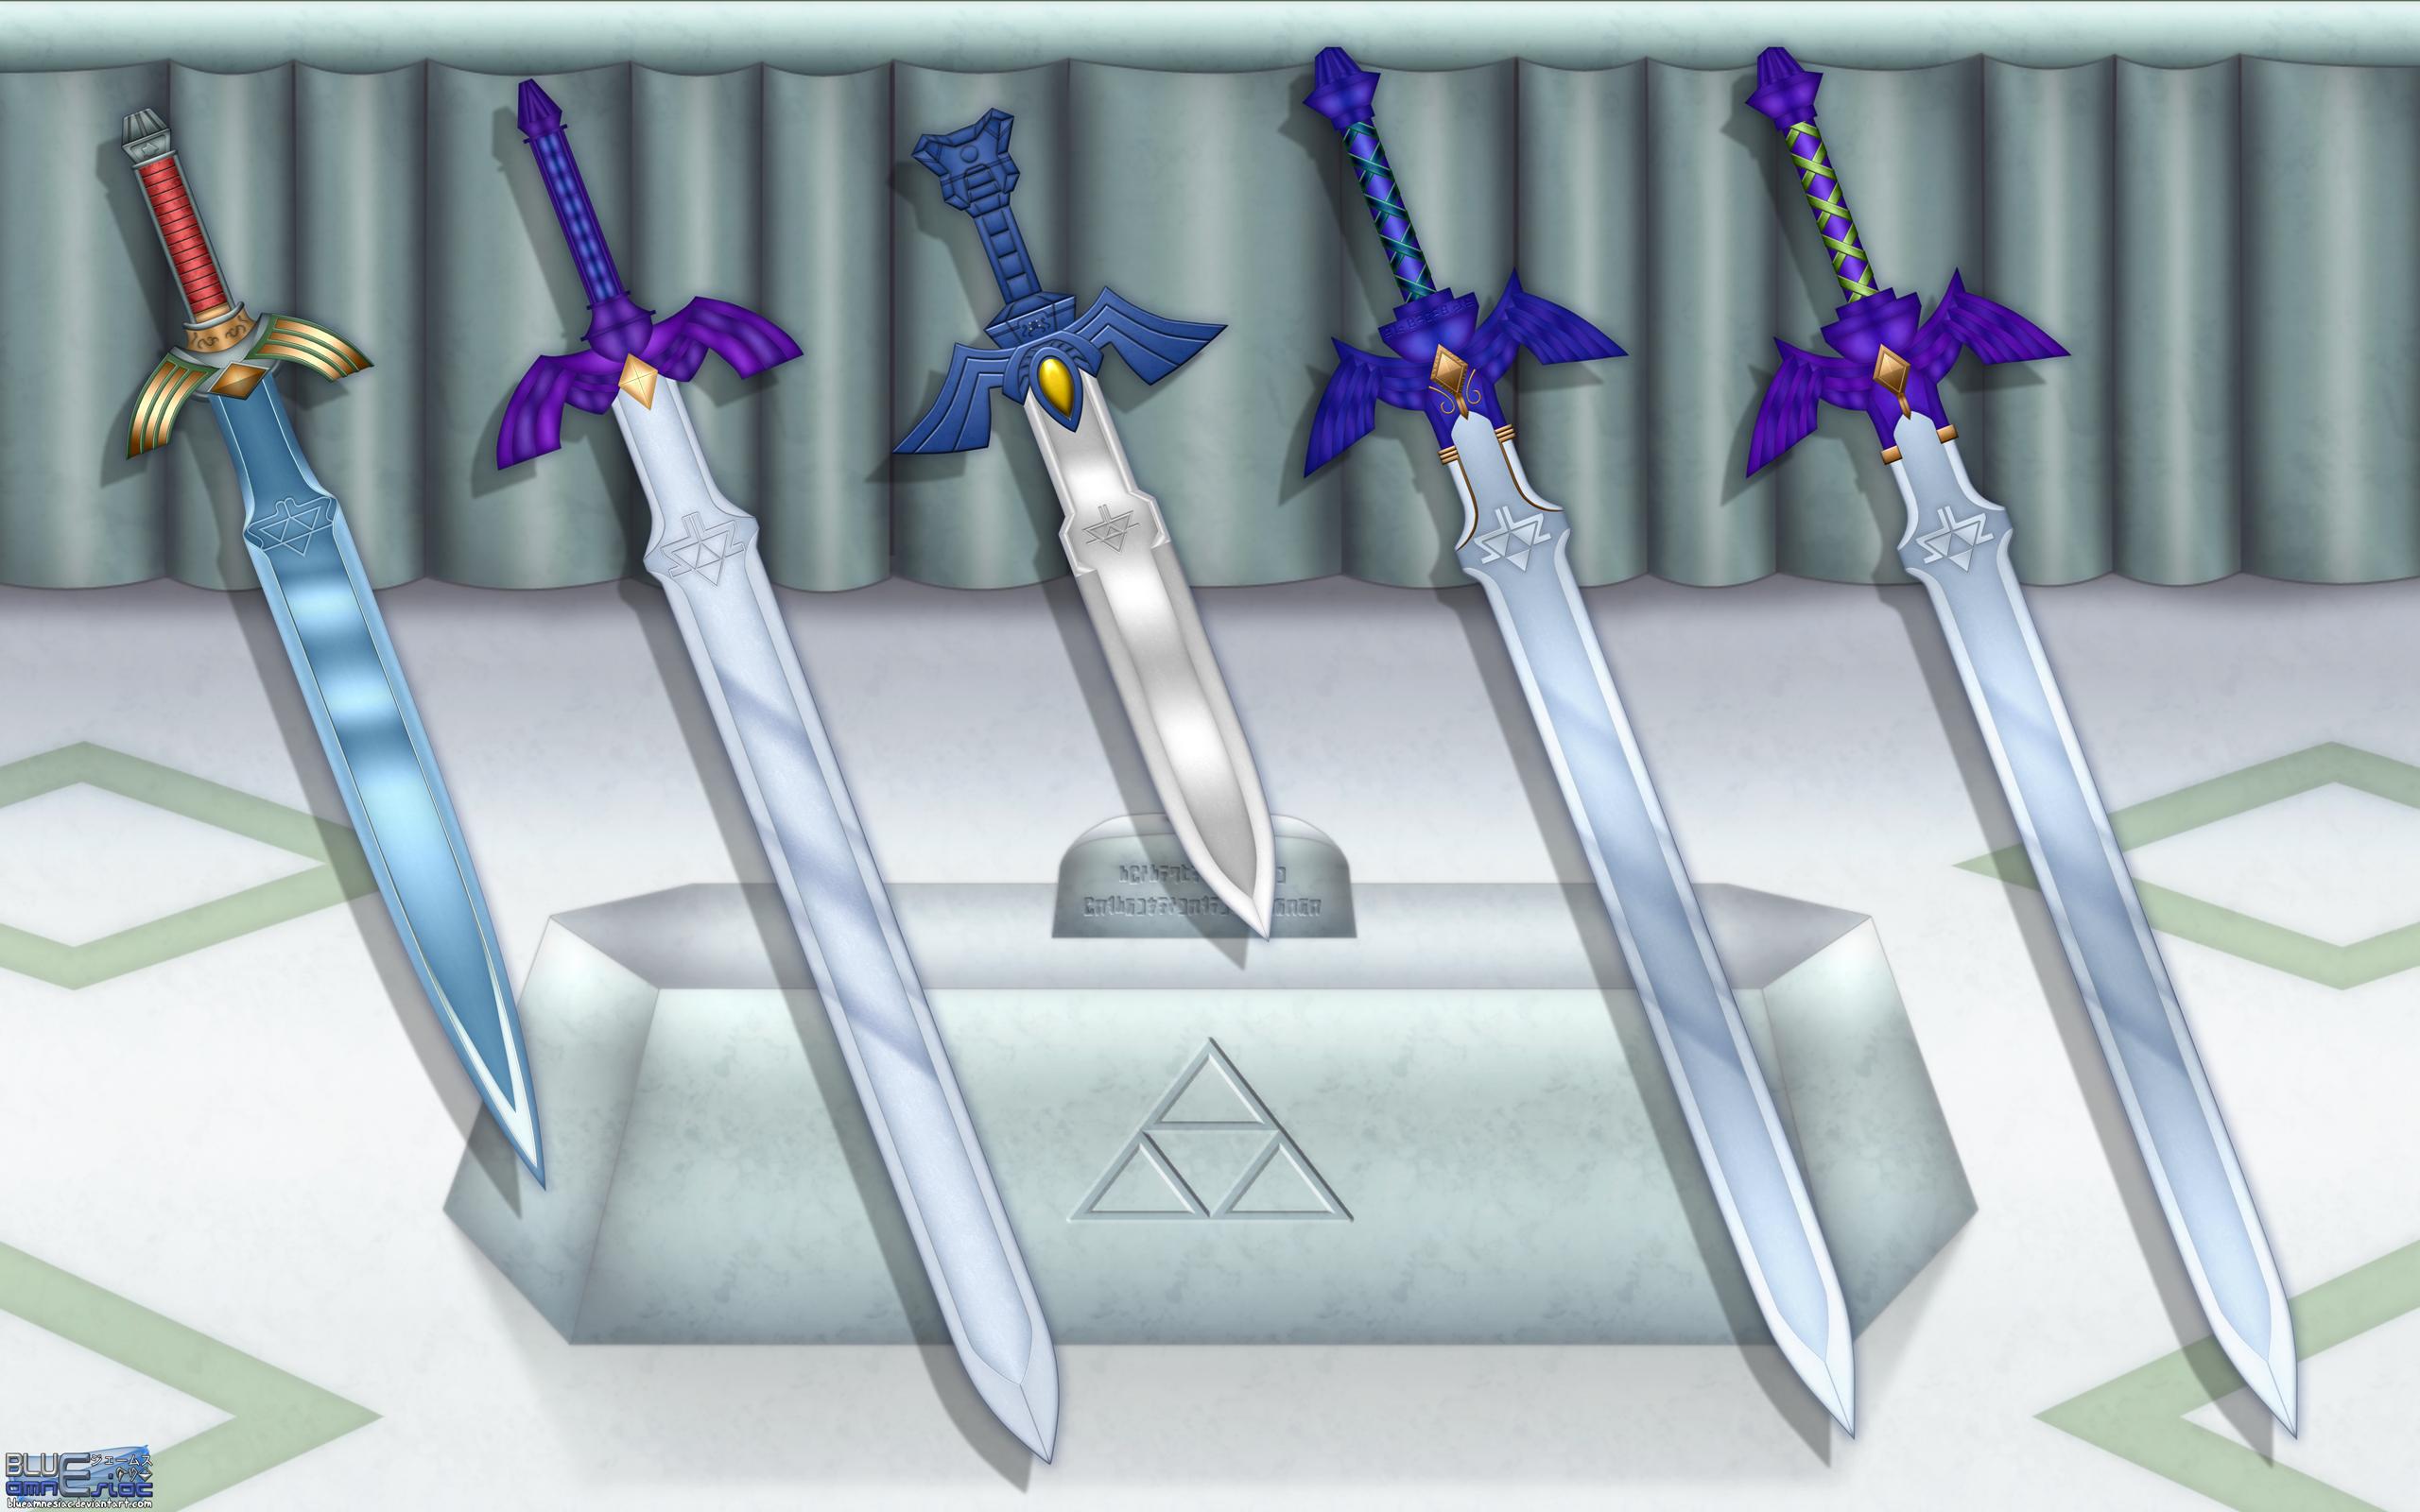 Evolution Of The Master Sword Wallpaper By BLUEamnesiac